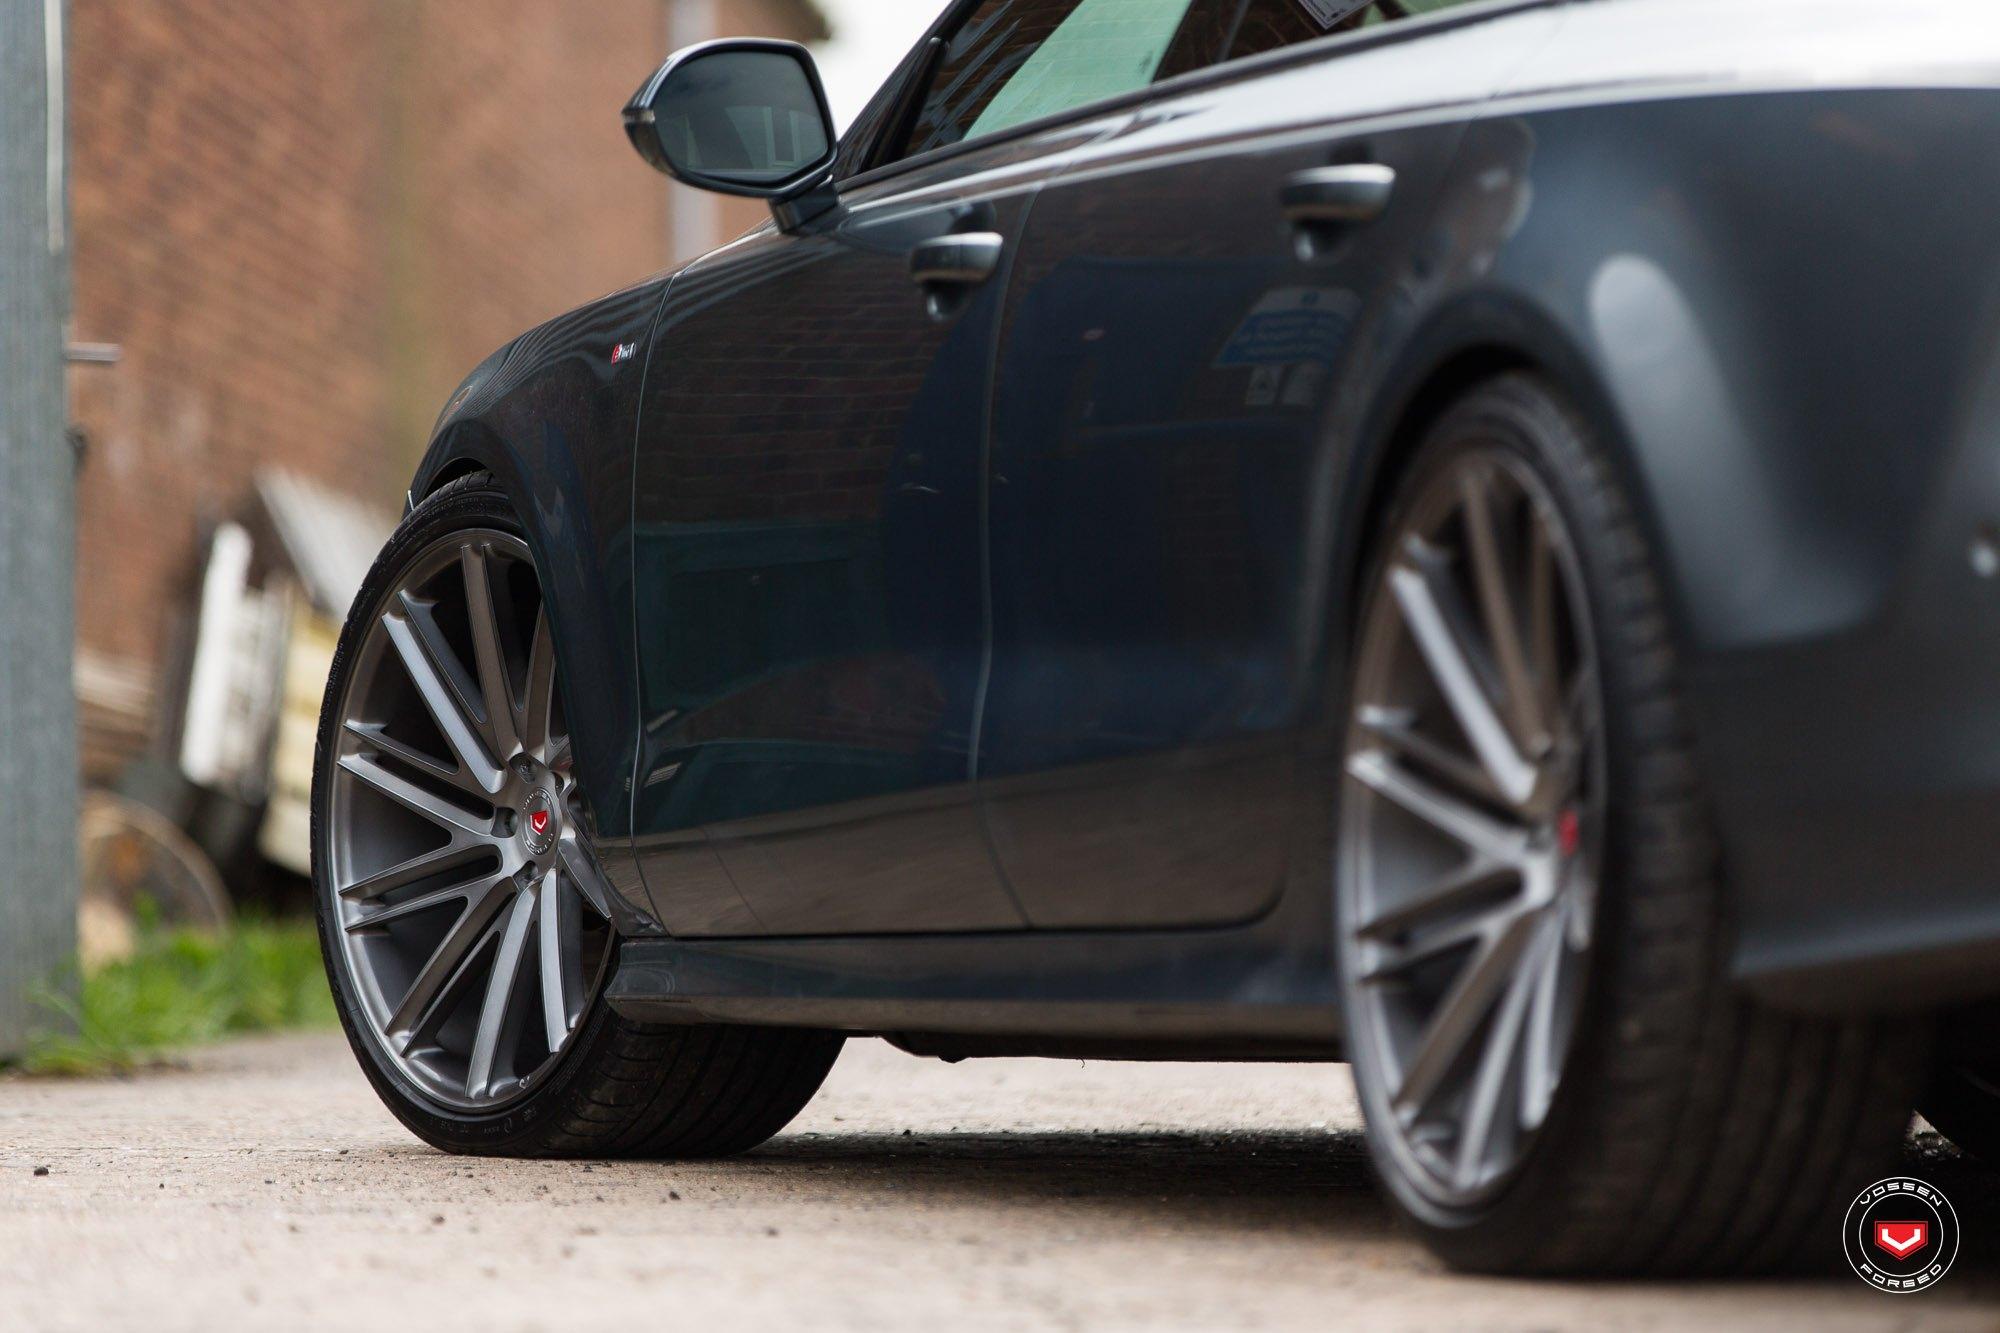 Audi Graphite Grey on audi moss green, audi bronze, audi chrome, audi cobalt blue, audi maroon, audi yellow, audi black, audi midnight blue, audi white, audi gold, audi purple,